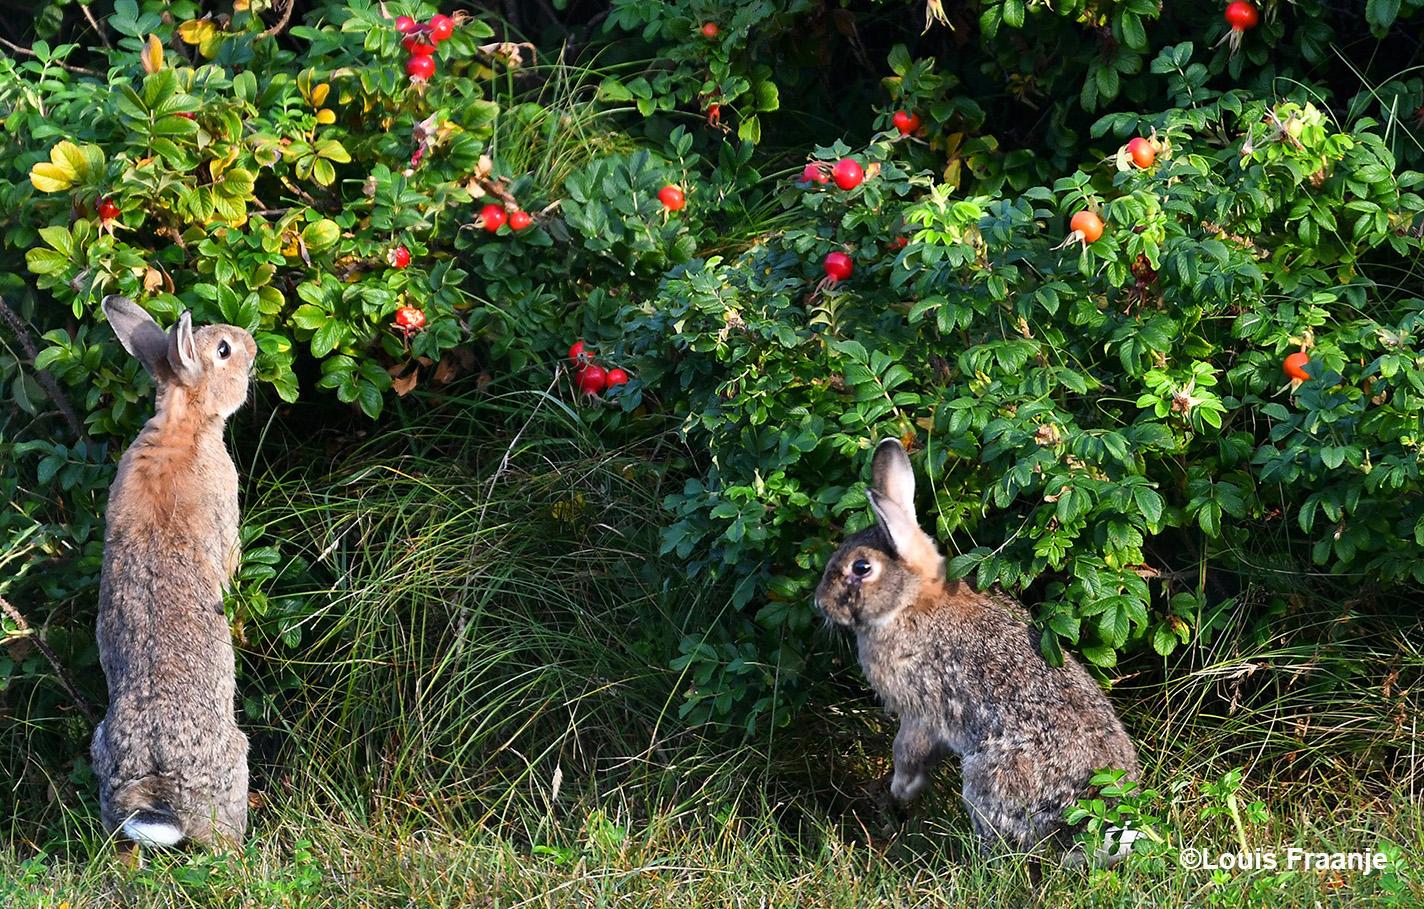 Lekker samen snoepen van de rozenbottels - Foto: ©Louis Fraanje